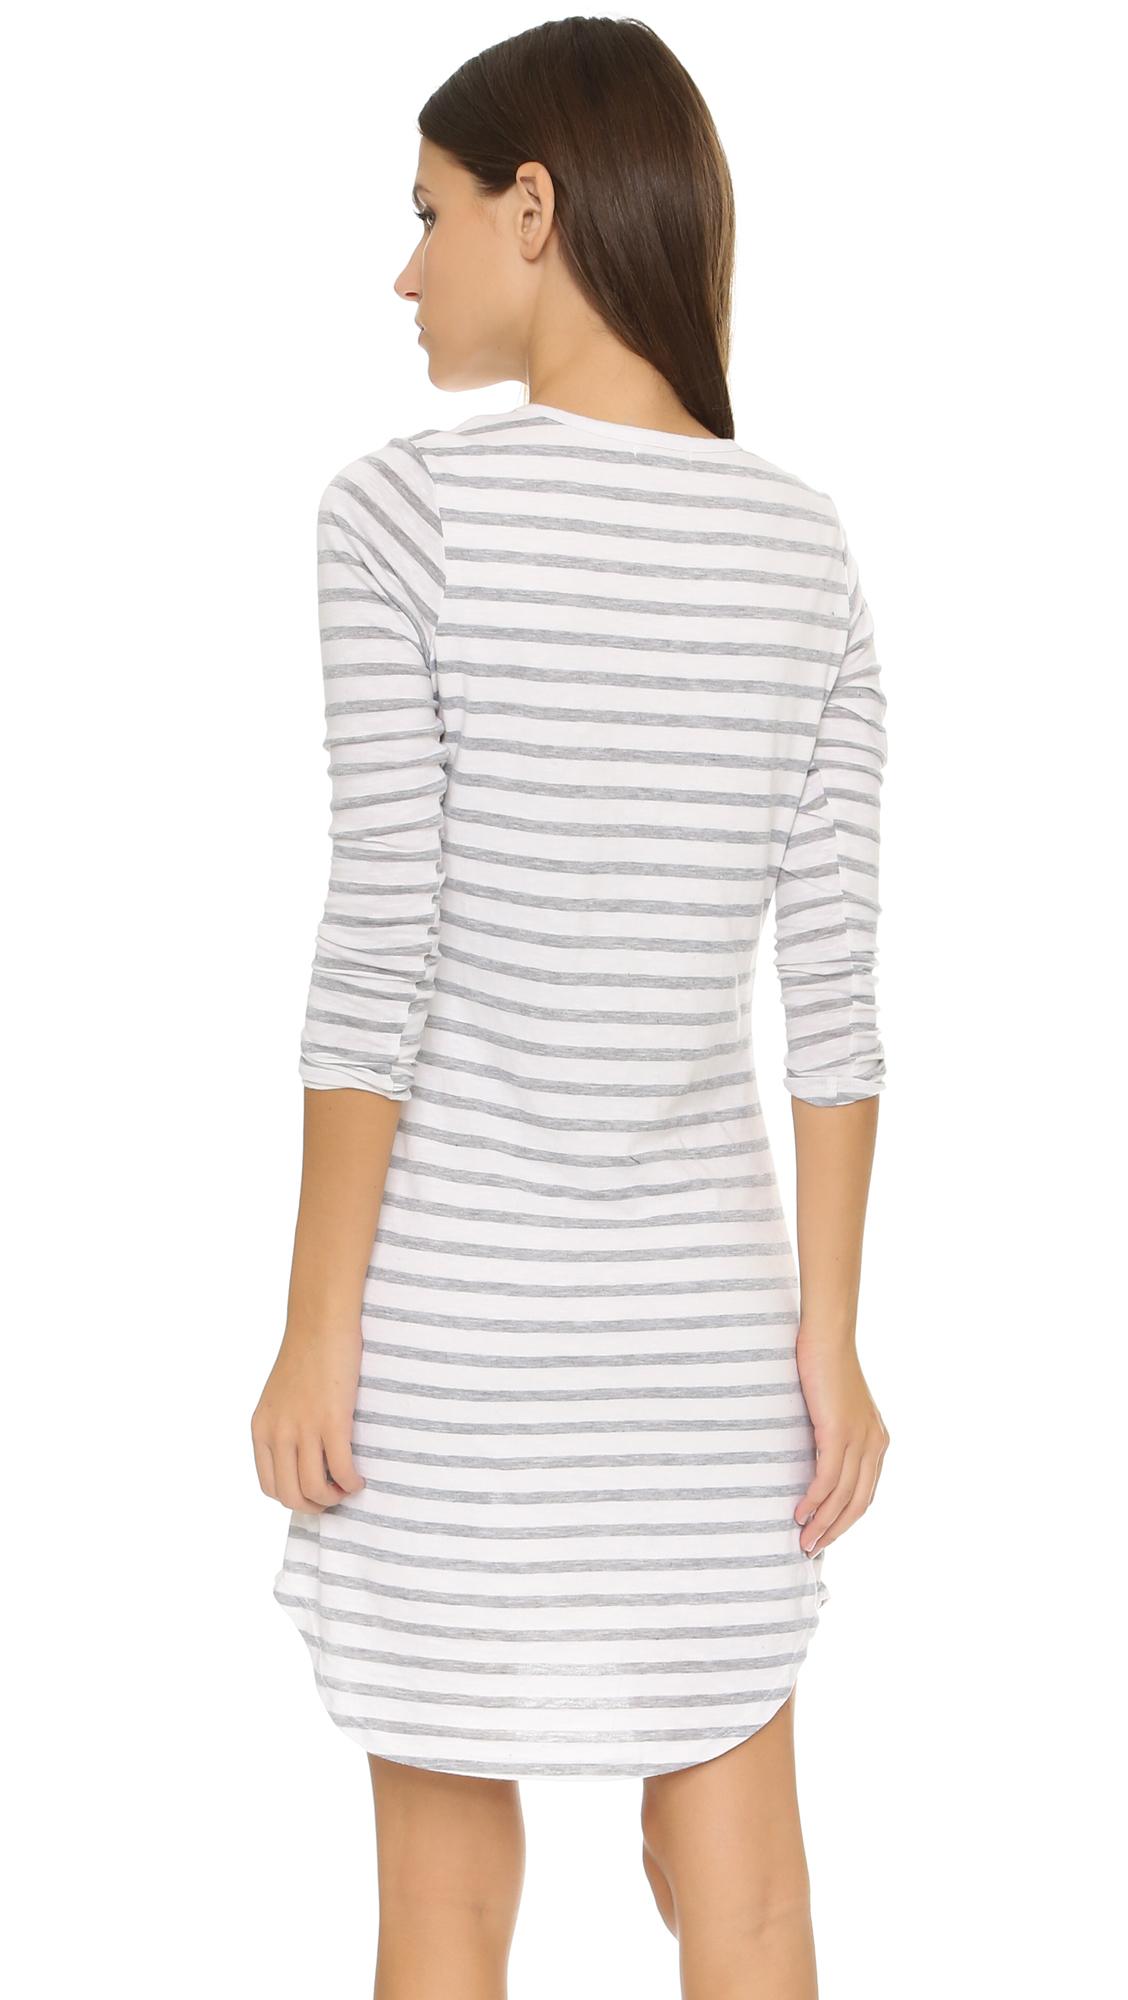 18cdbb62c45aa Sundry Long Sleeve Pocket Dress in White - Lyst